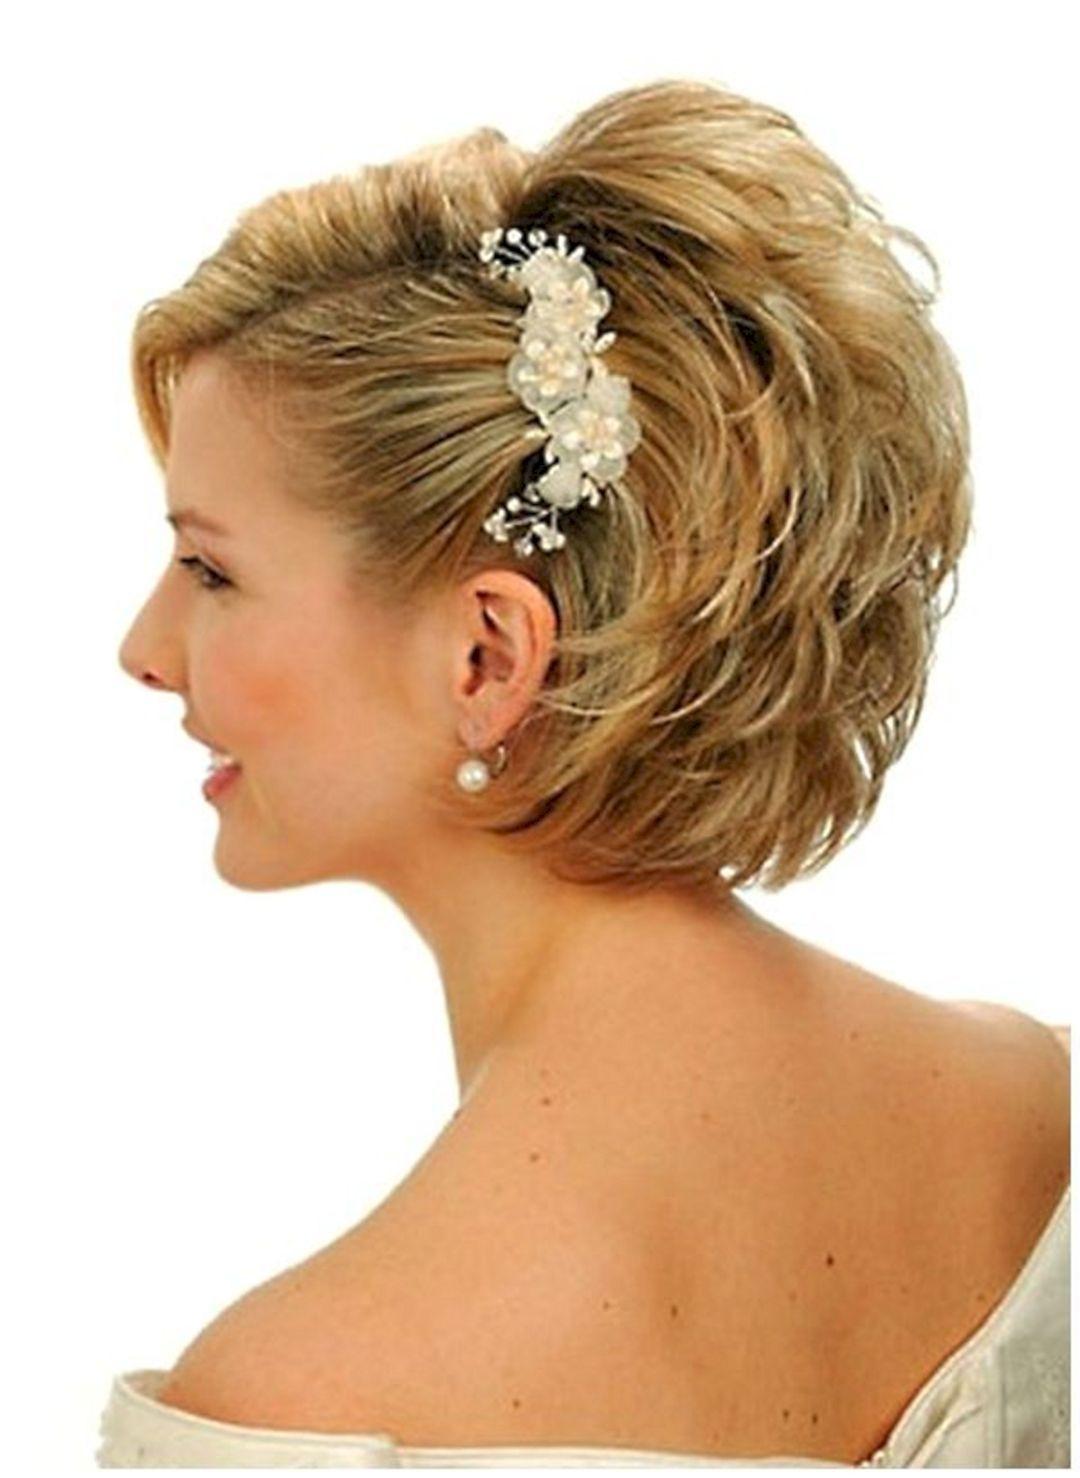 elegant short updo hairstyles for summer weddings ideas short